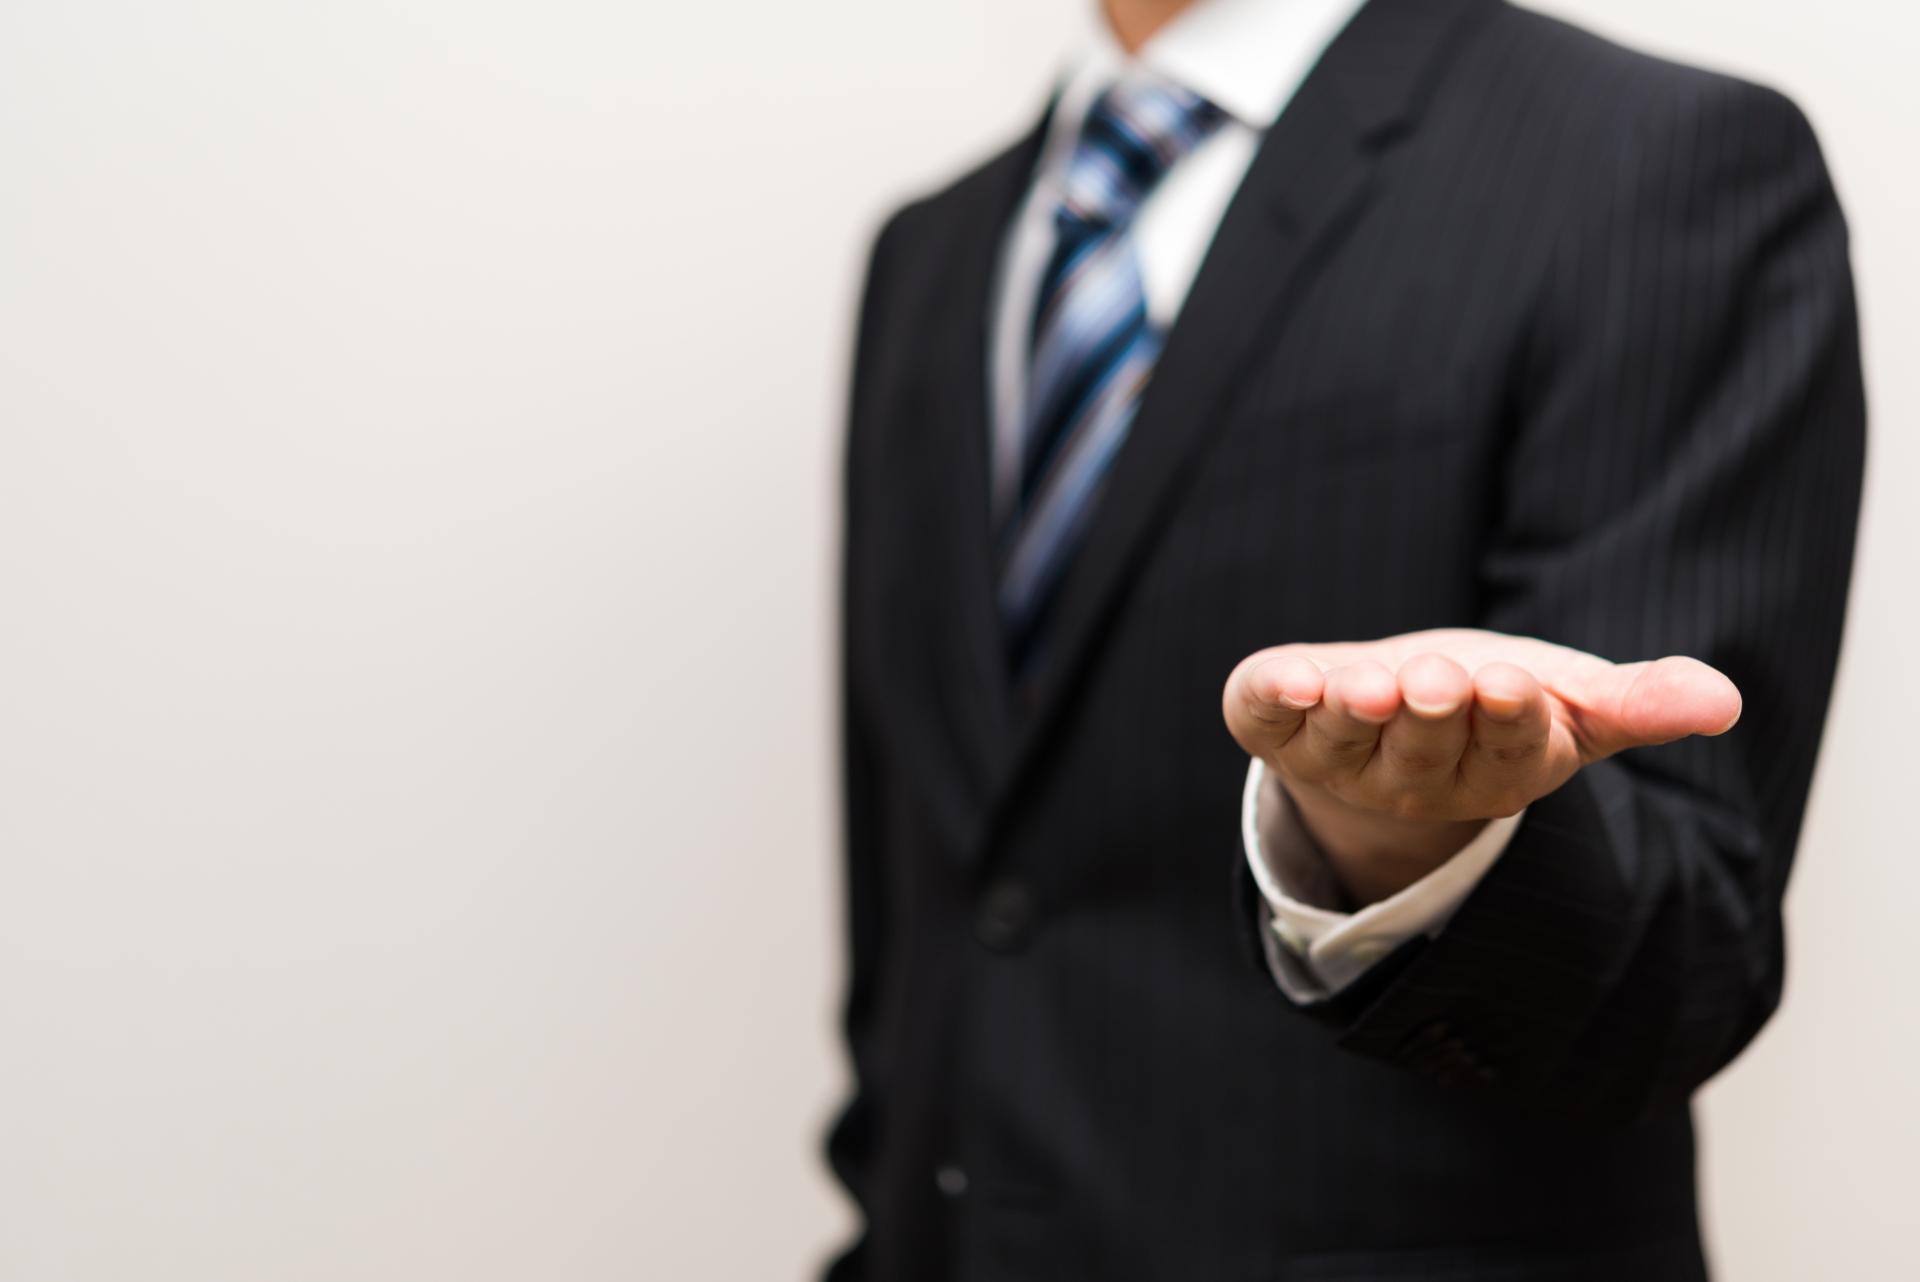 iDeCoは公務員におすすめ!手続きや掛け金の上限・節税・年末調整は?